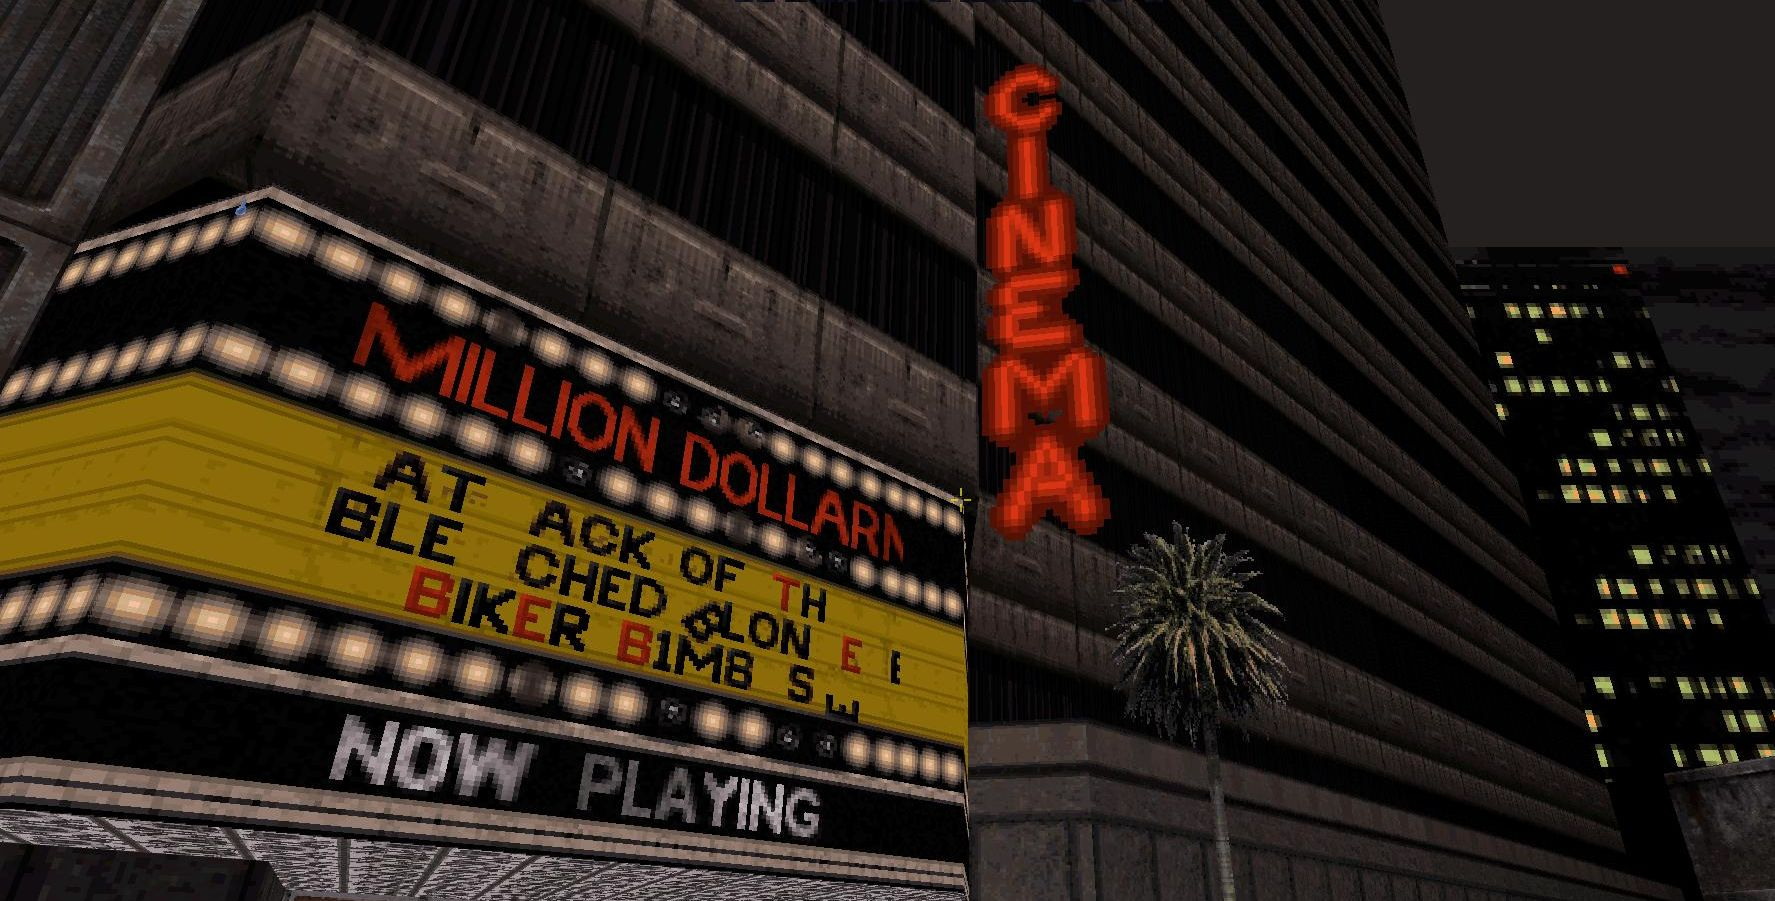 Great moments in PC gaming: Exploring the cinema in Duke Nukem 3D